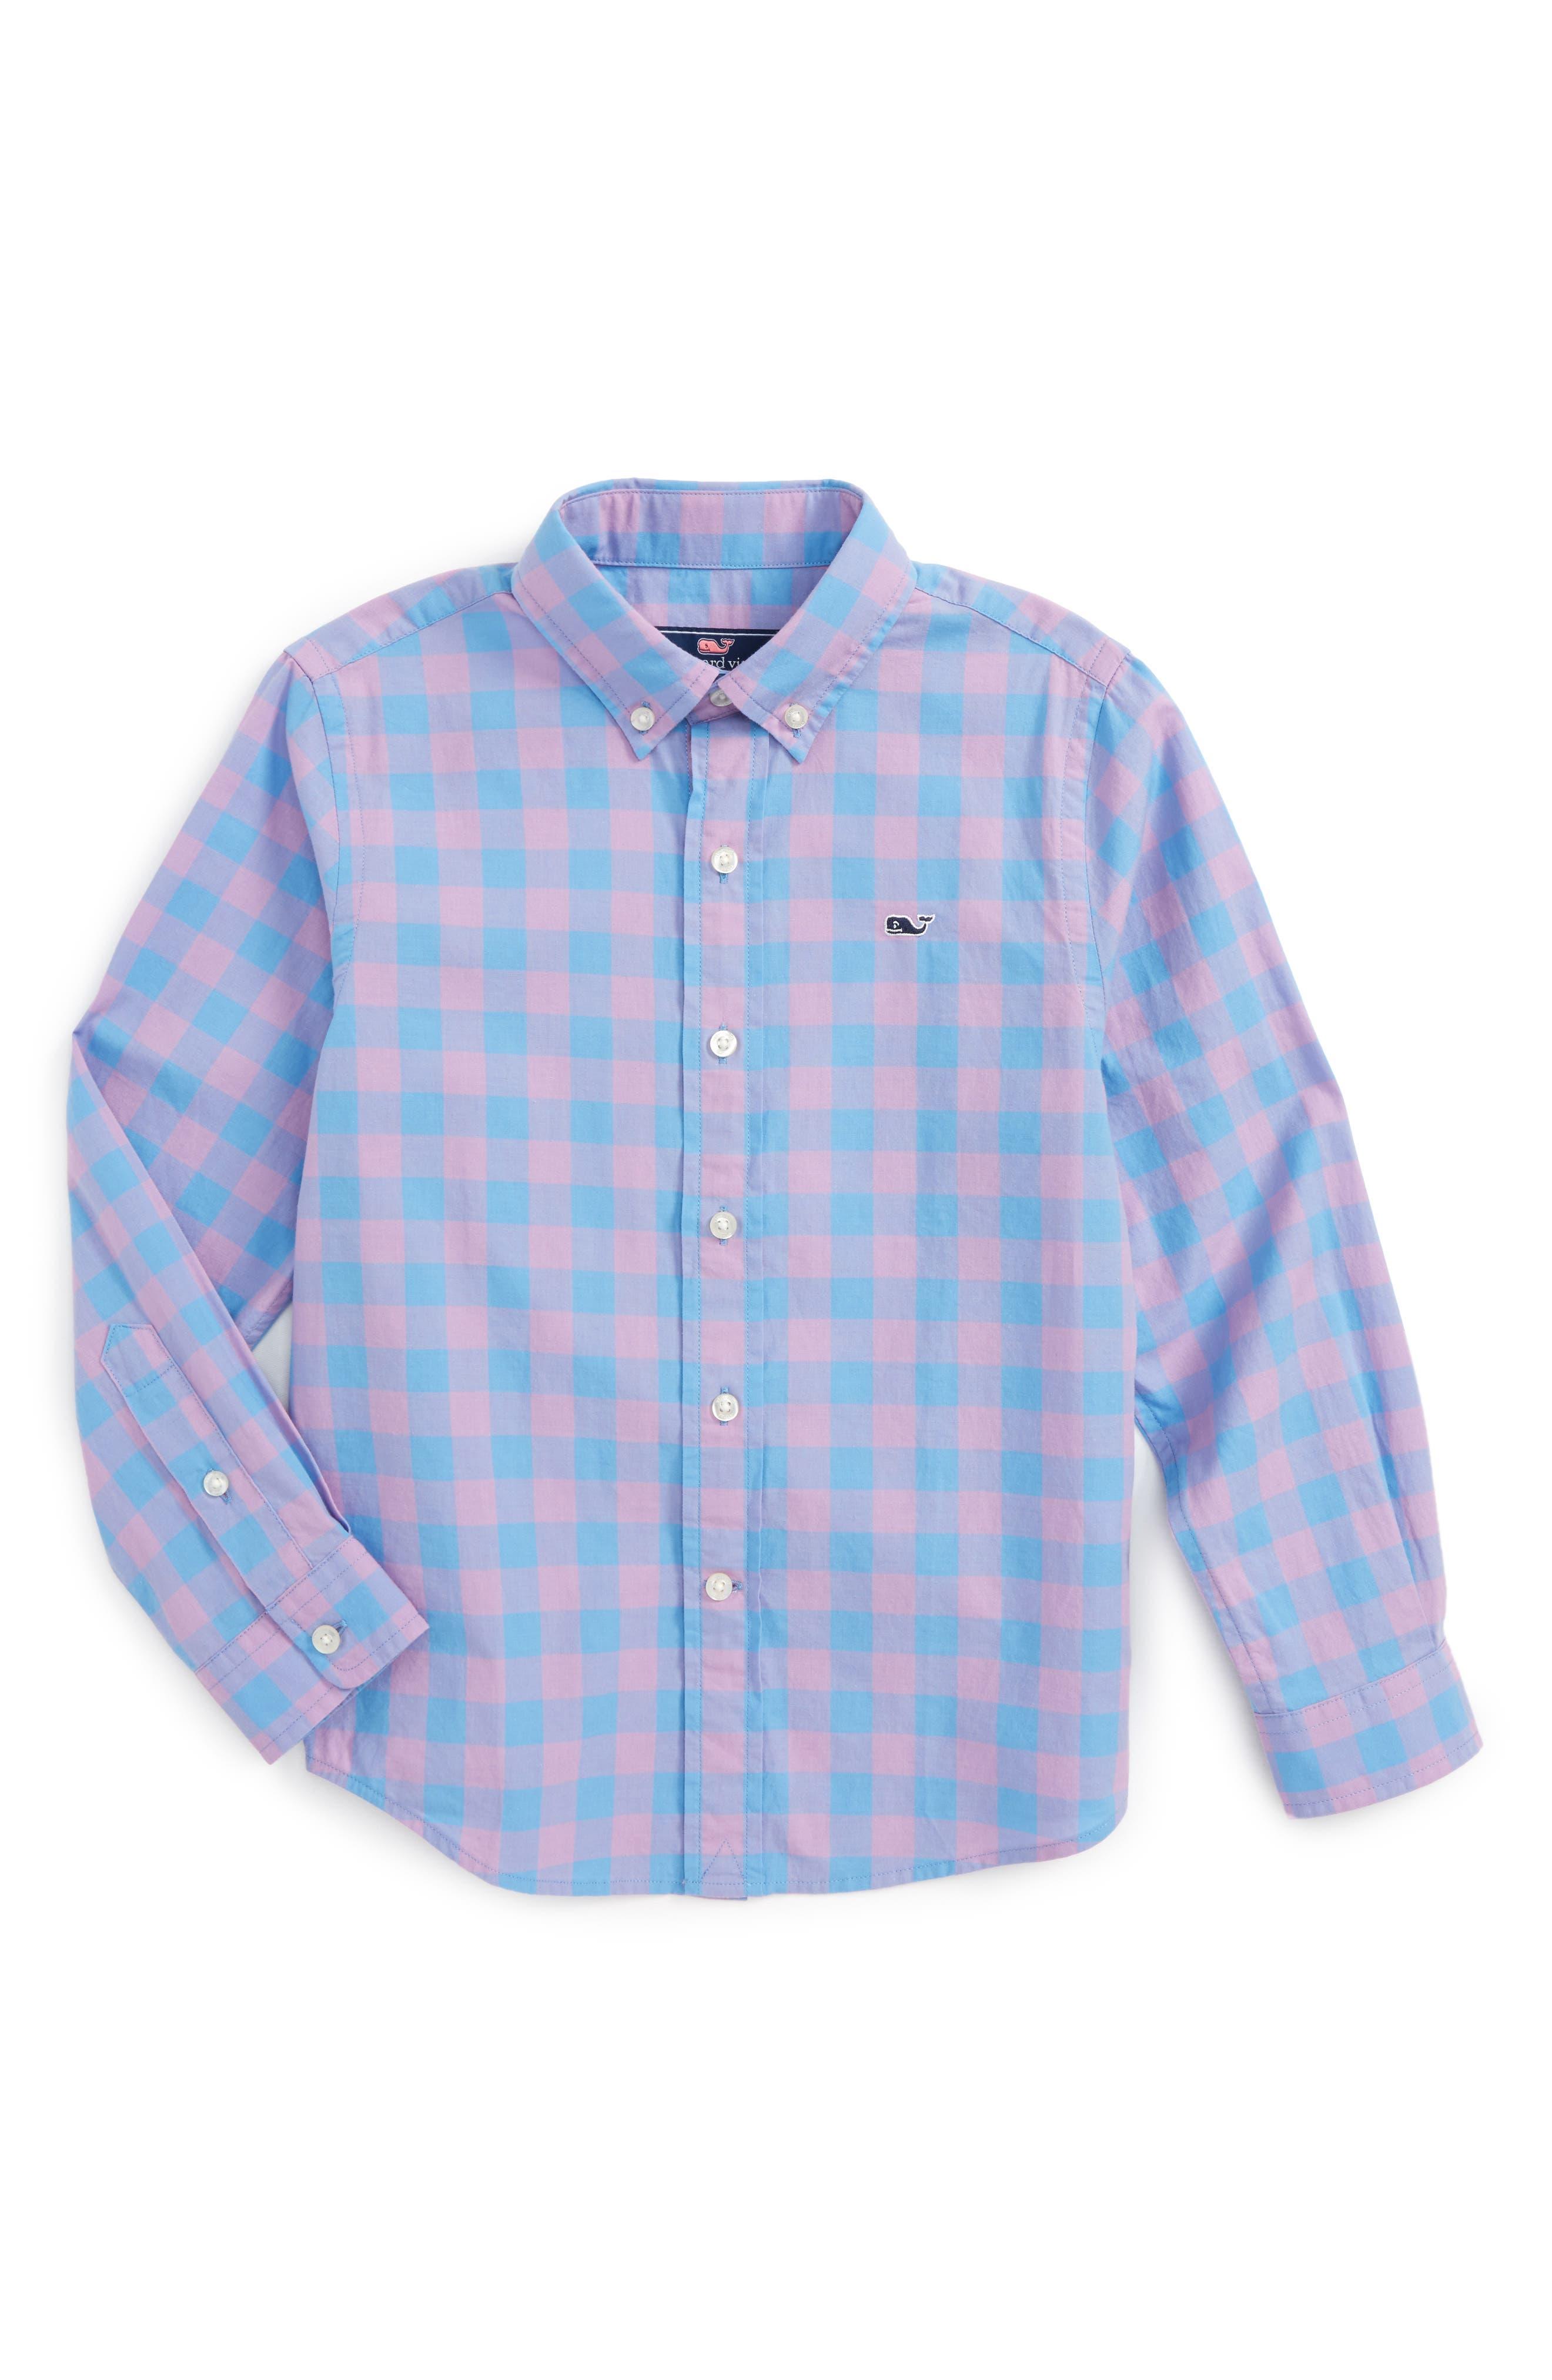 Vineyard Vines Deep Hollow Check Whale Shirt (Toddler Boys, Little Boys & Big Boys)